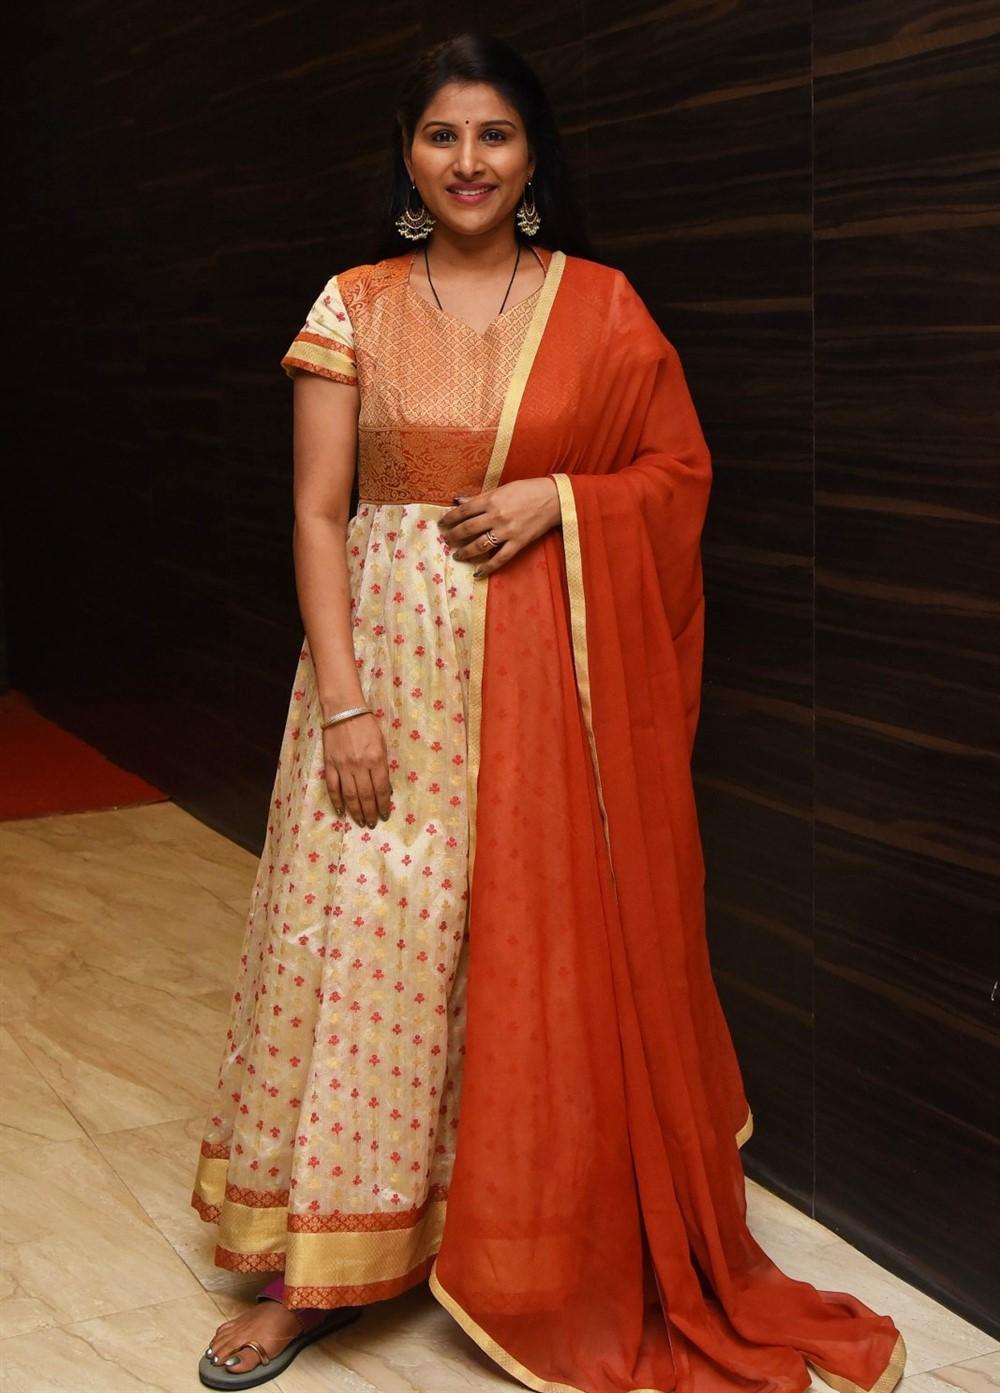 Telugu Actress Mangli Stills @ Gully Rowdy Pre Release